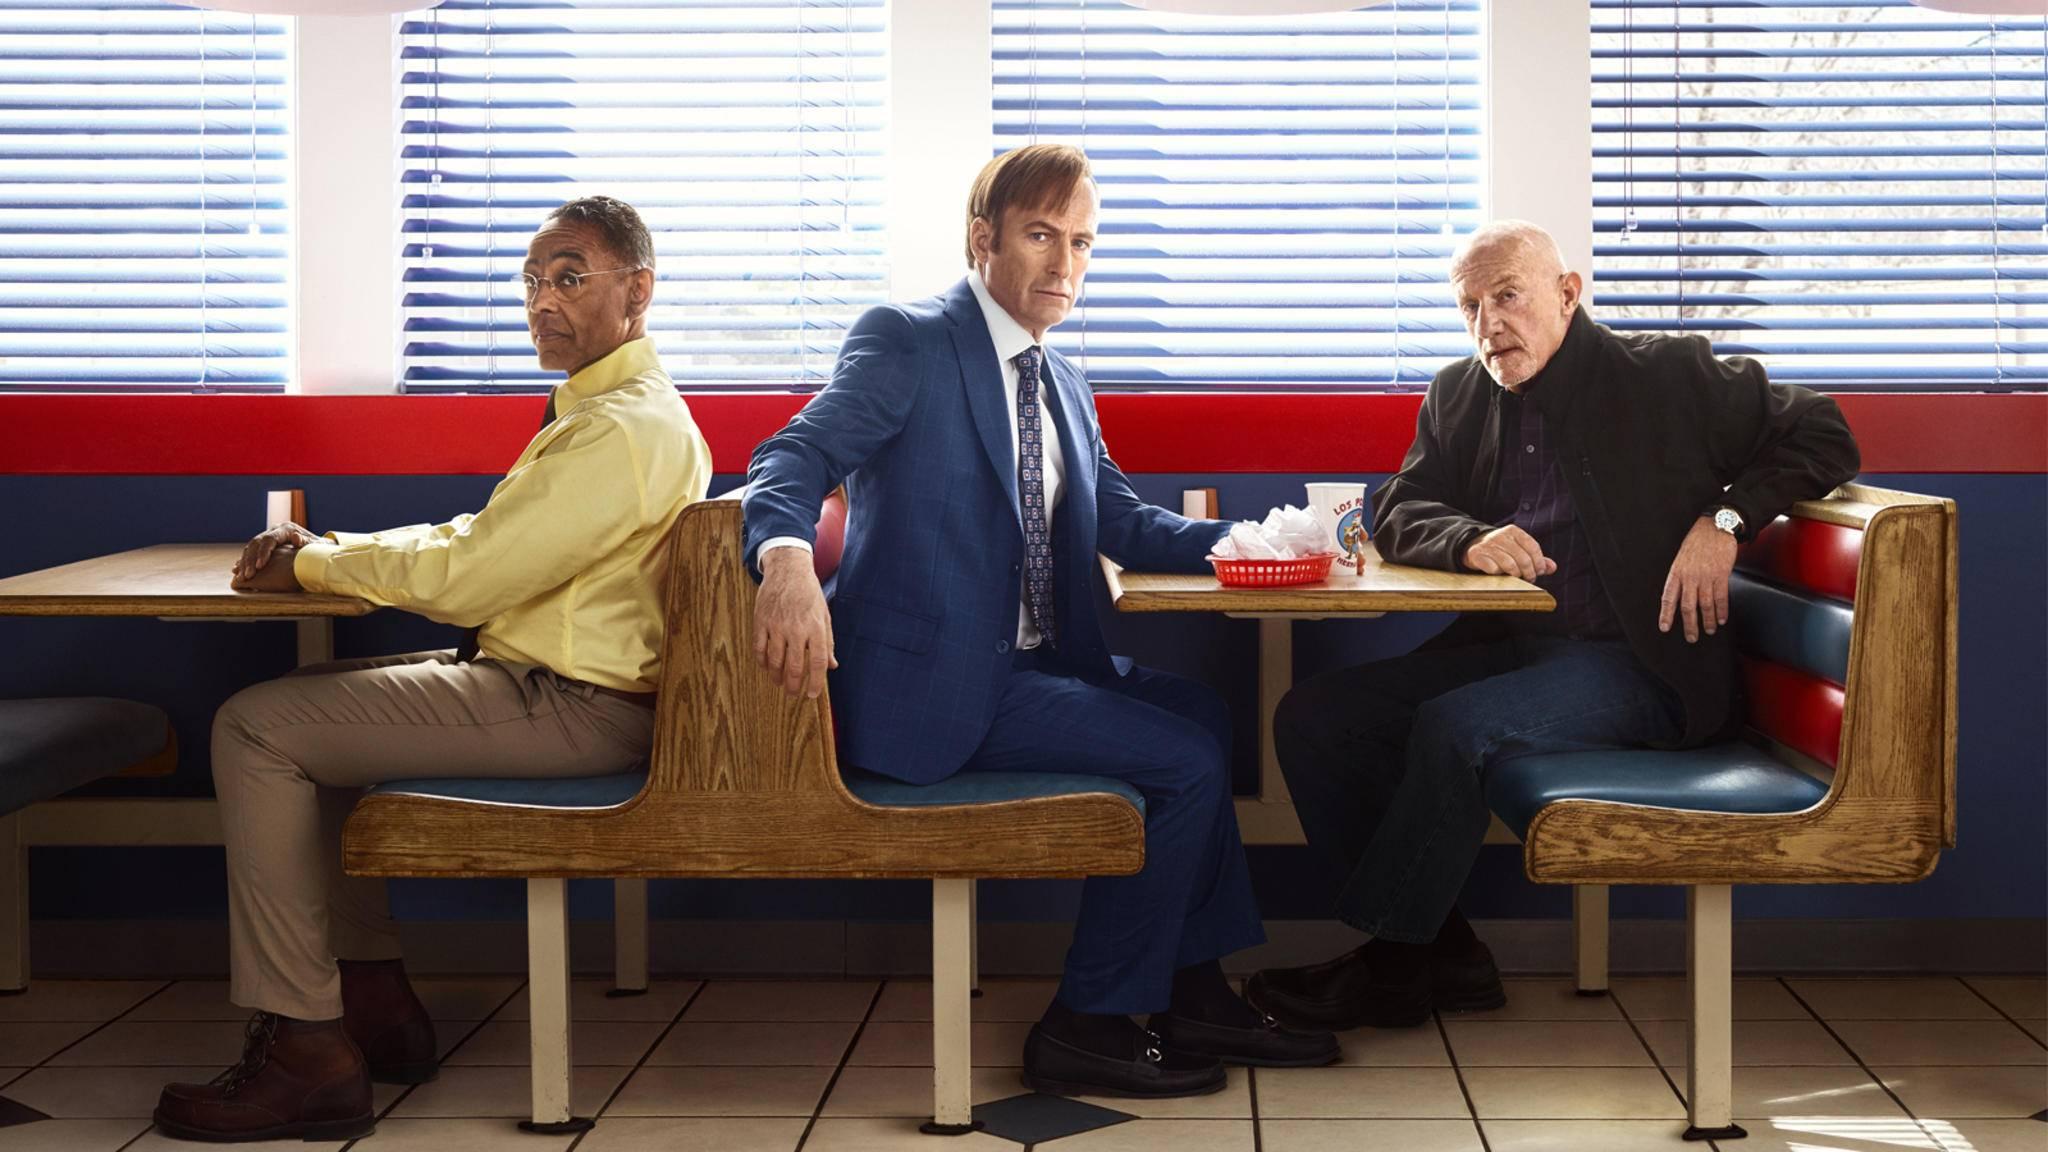 Perfekte Fassade: Gus Fring (Giancarlo Esposito, l.) tarnt sein Drogengeschäft als Fast-Food-Kette.